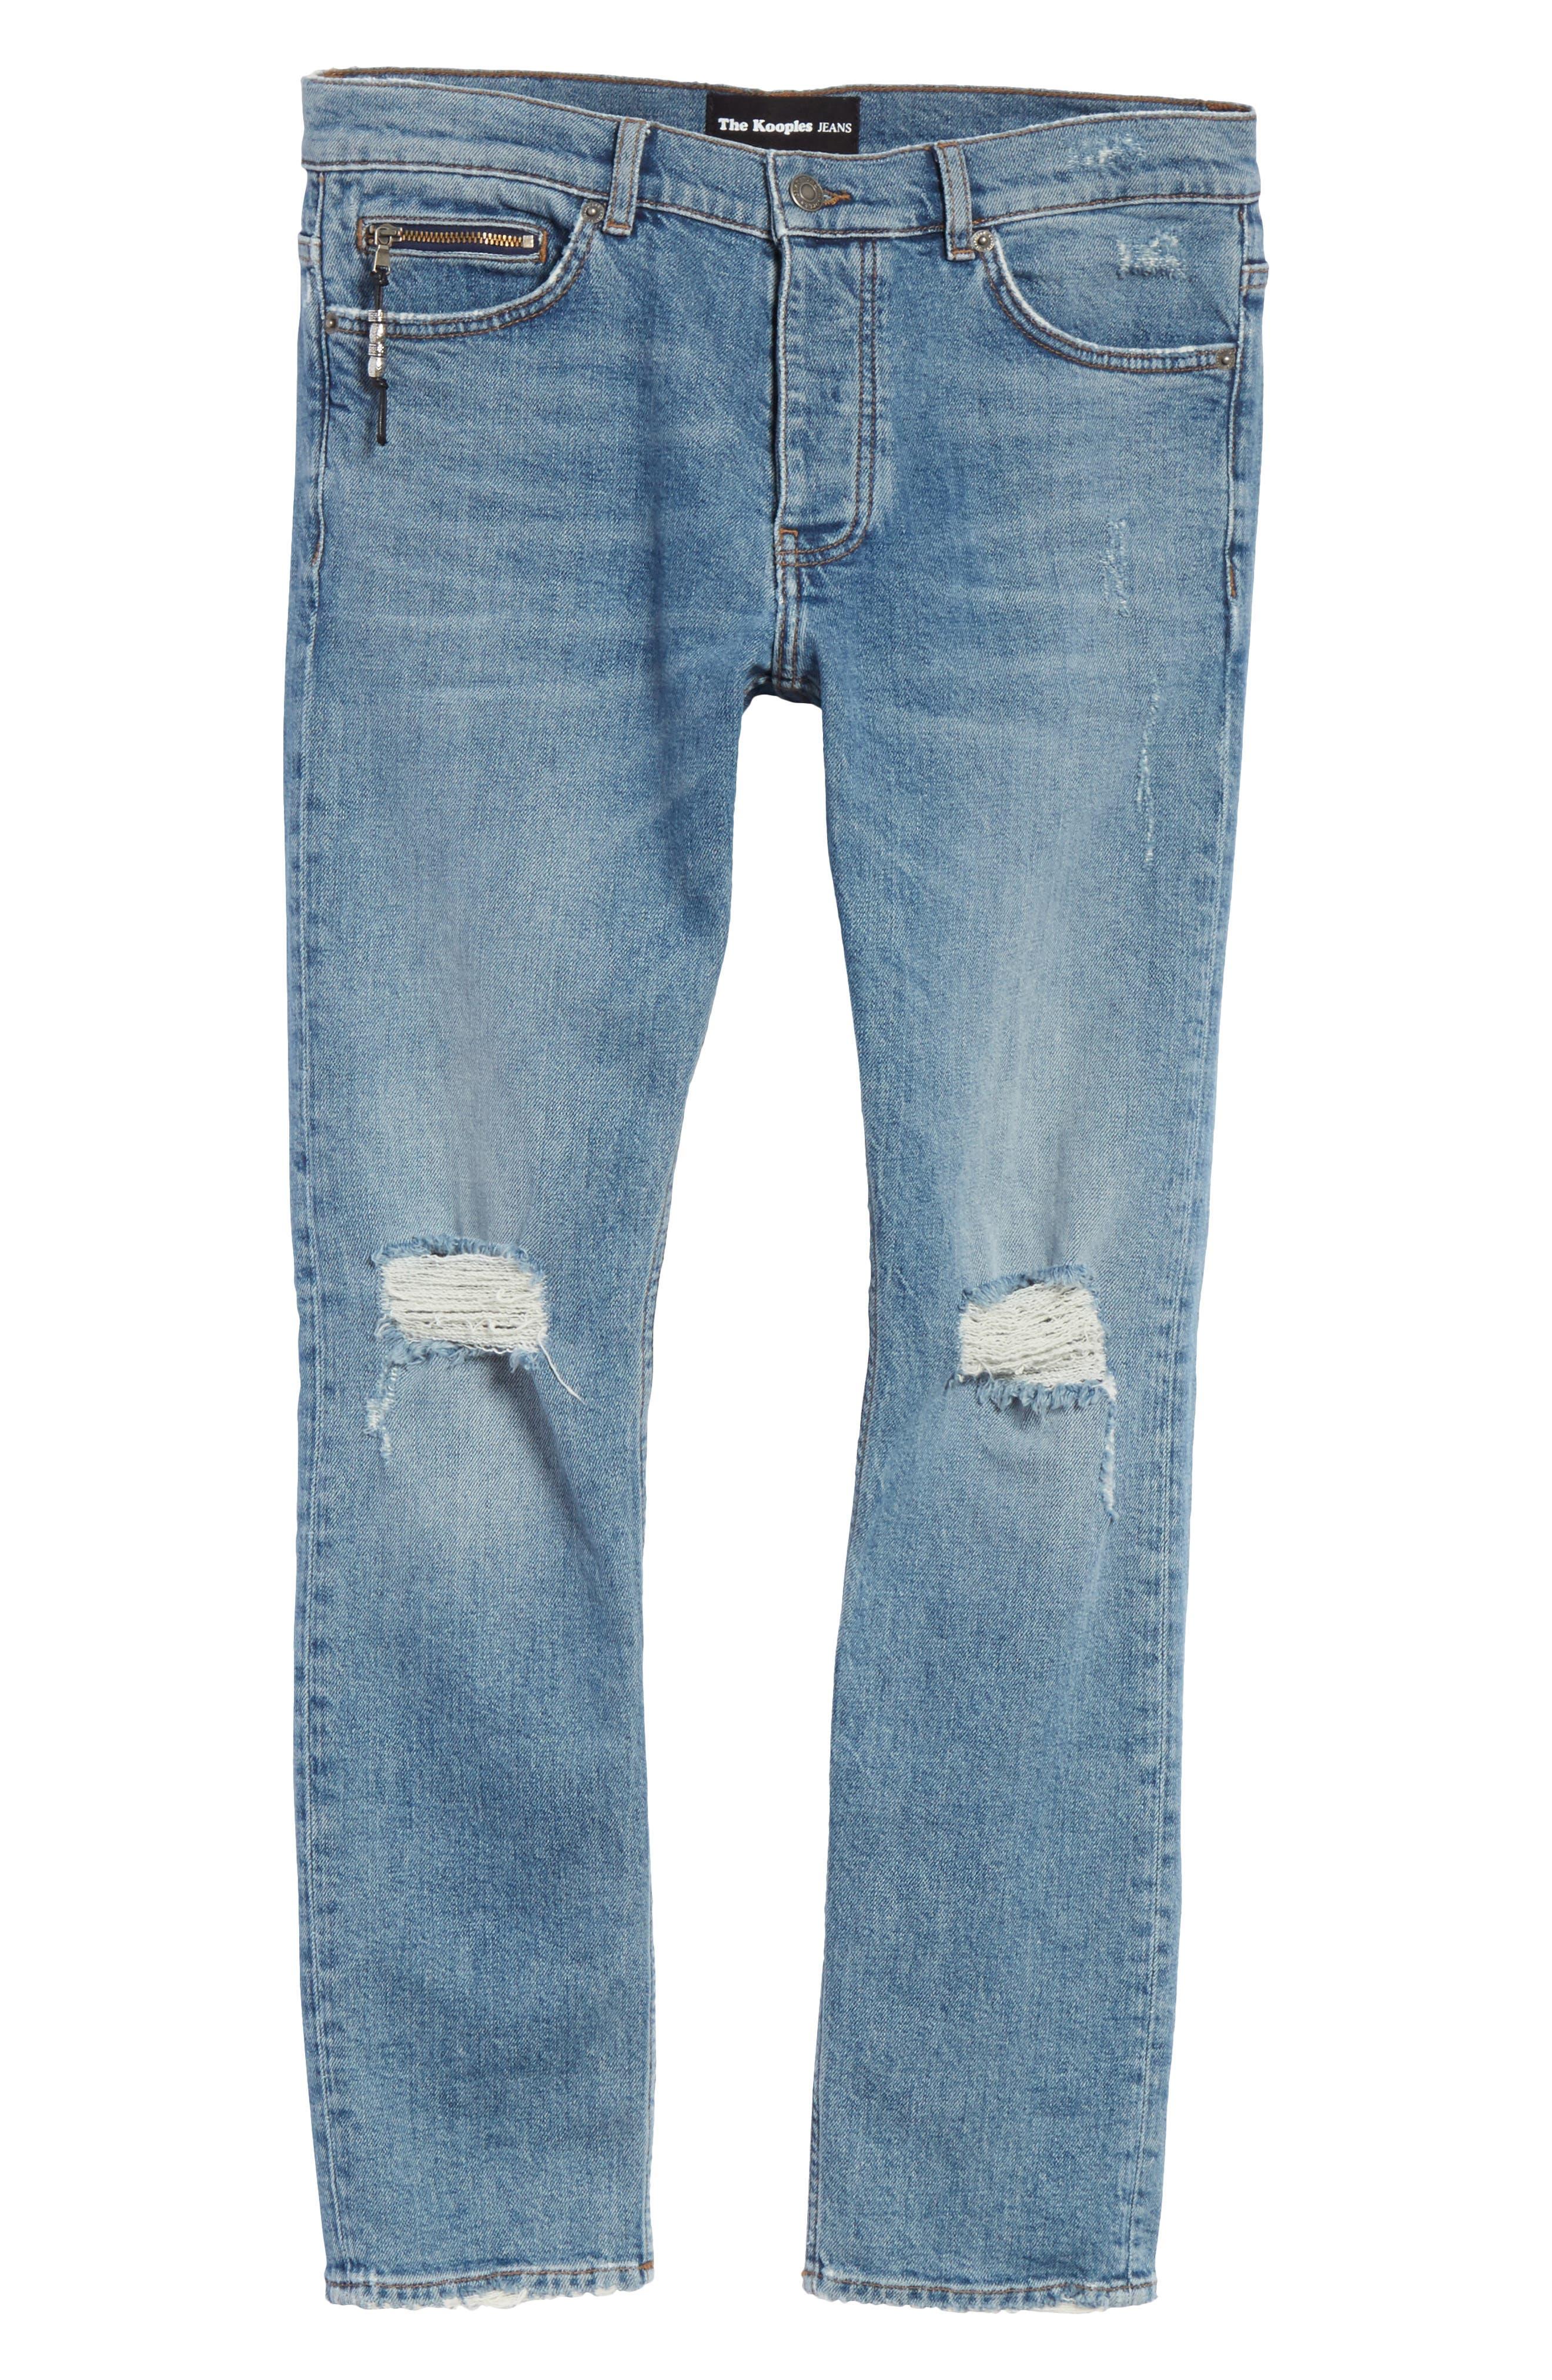 Destroyed Skinny Fit Jeans,                             Alternate thumbnail 6, color,                             Blu 88